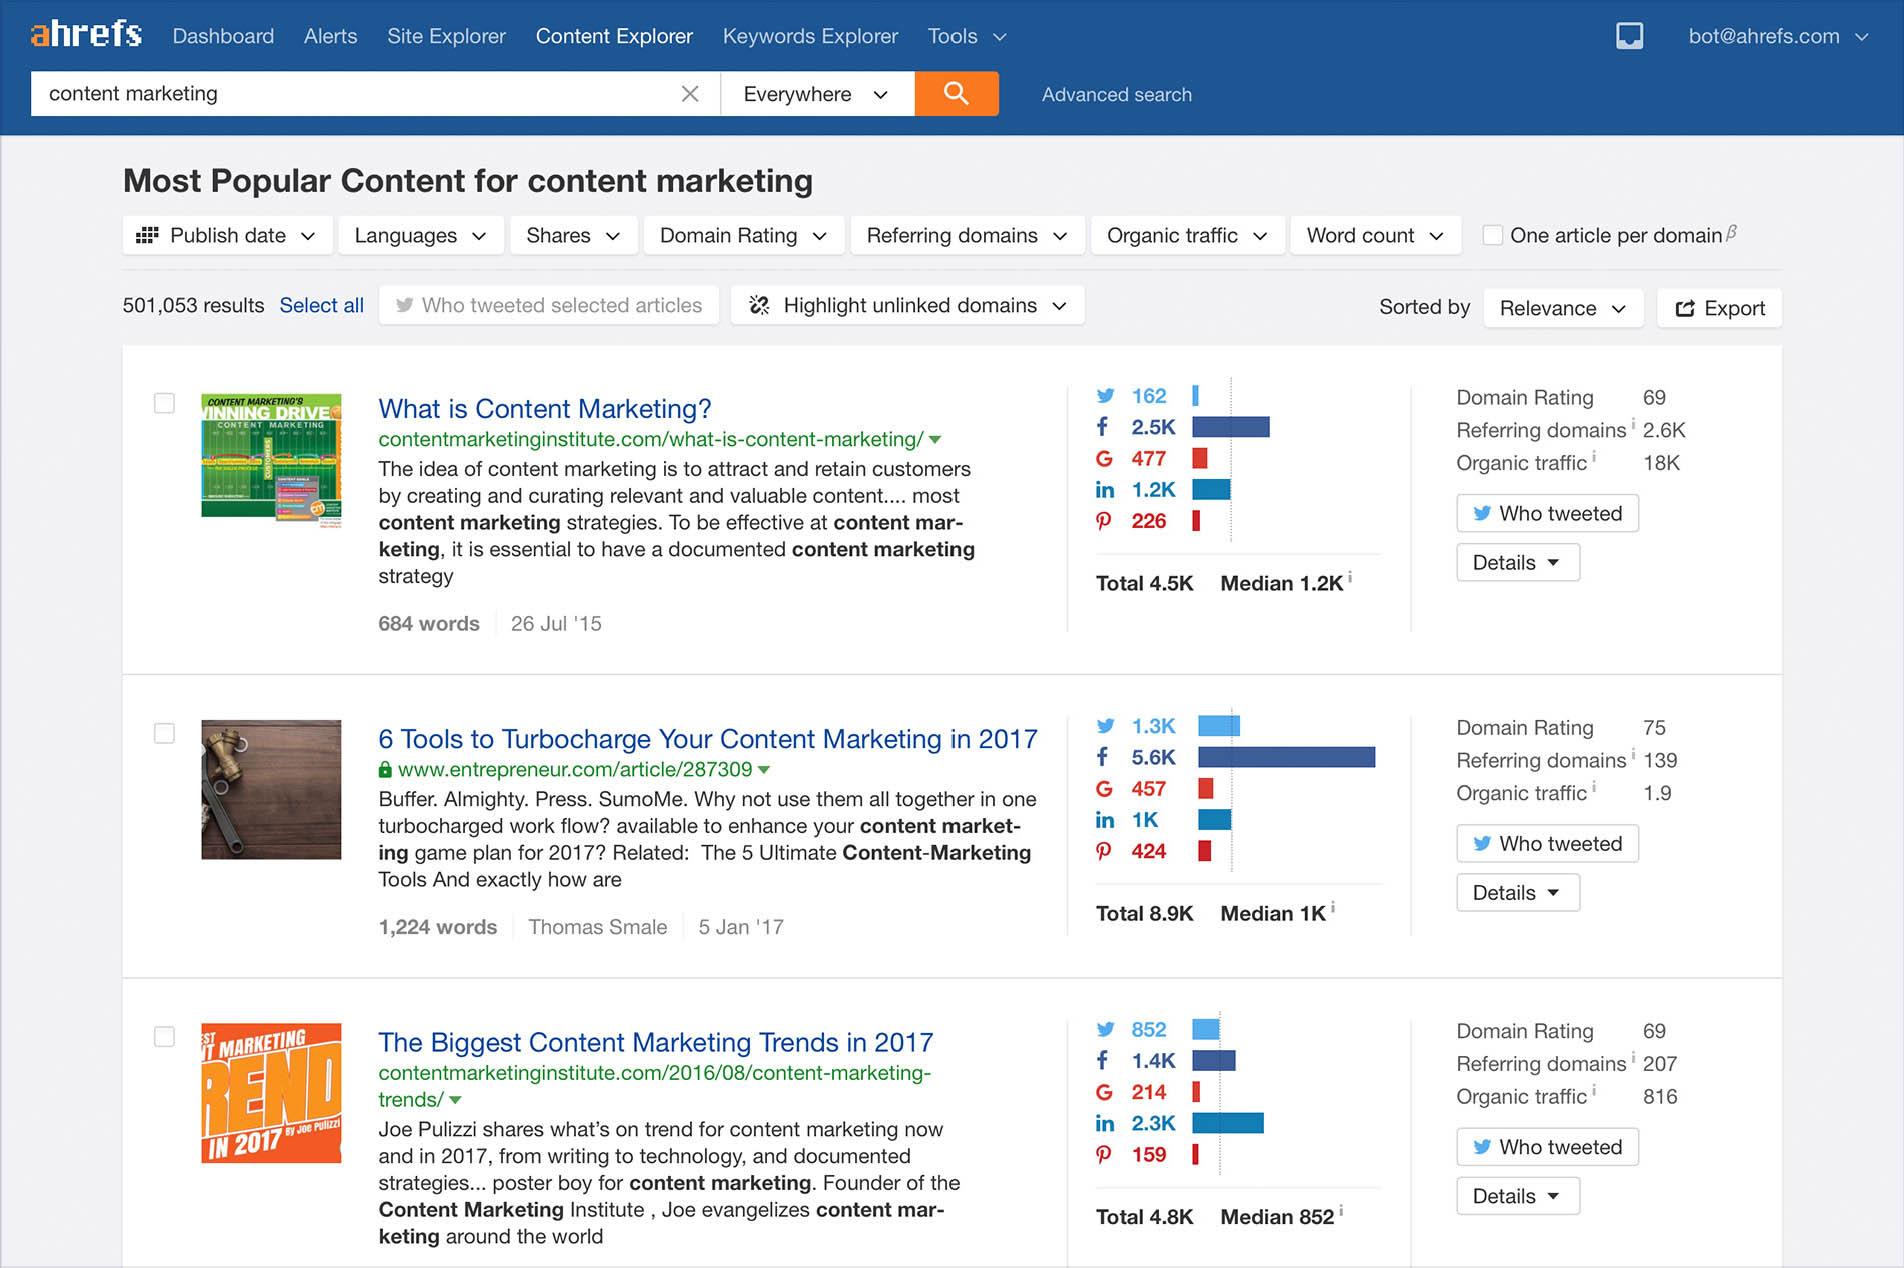 SEO Tools Software Comparison - Ahrefs